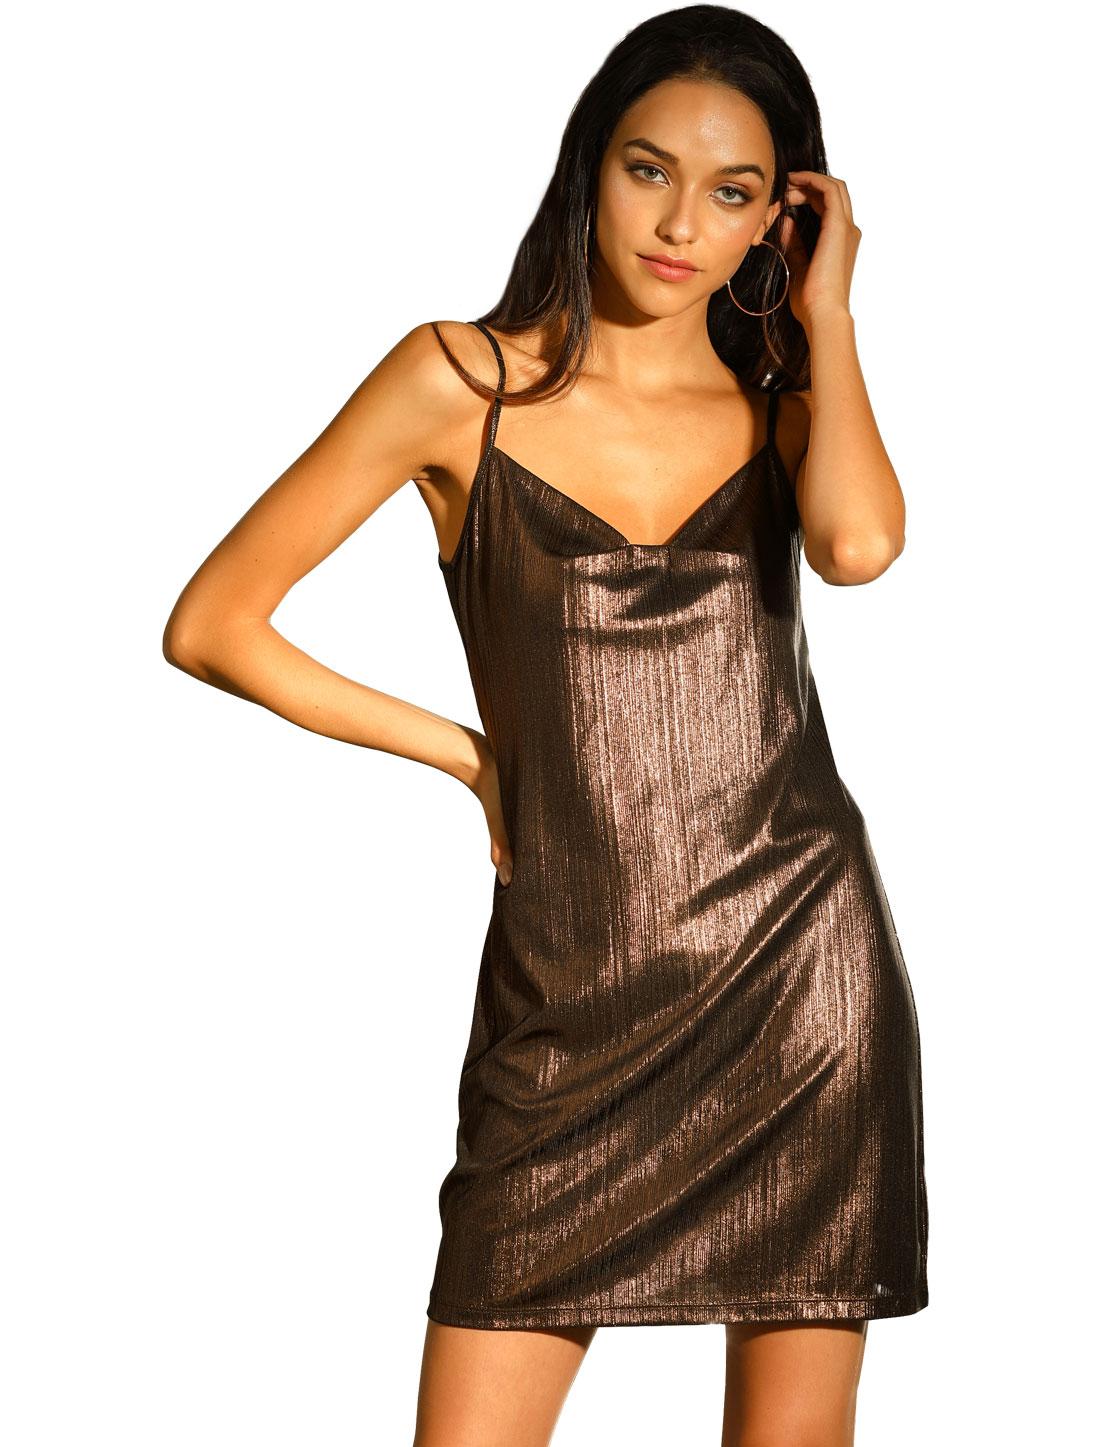 Allegra K Women's Sparkly Glitter Spaghetti Strap Party Dress Coffee Brown L